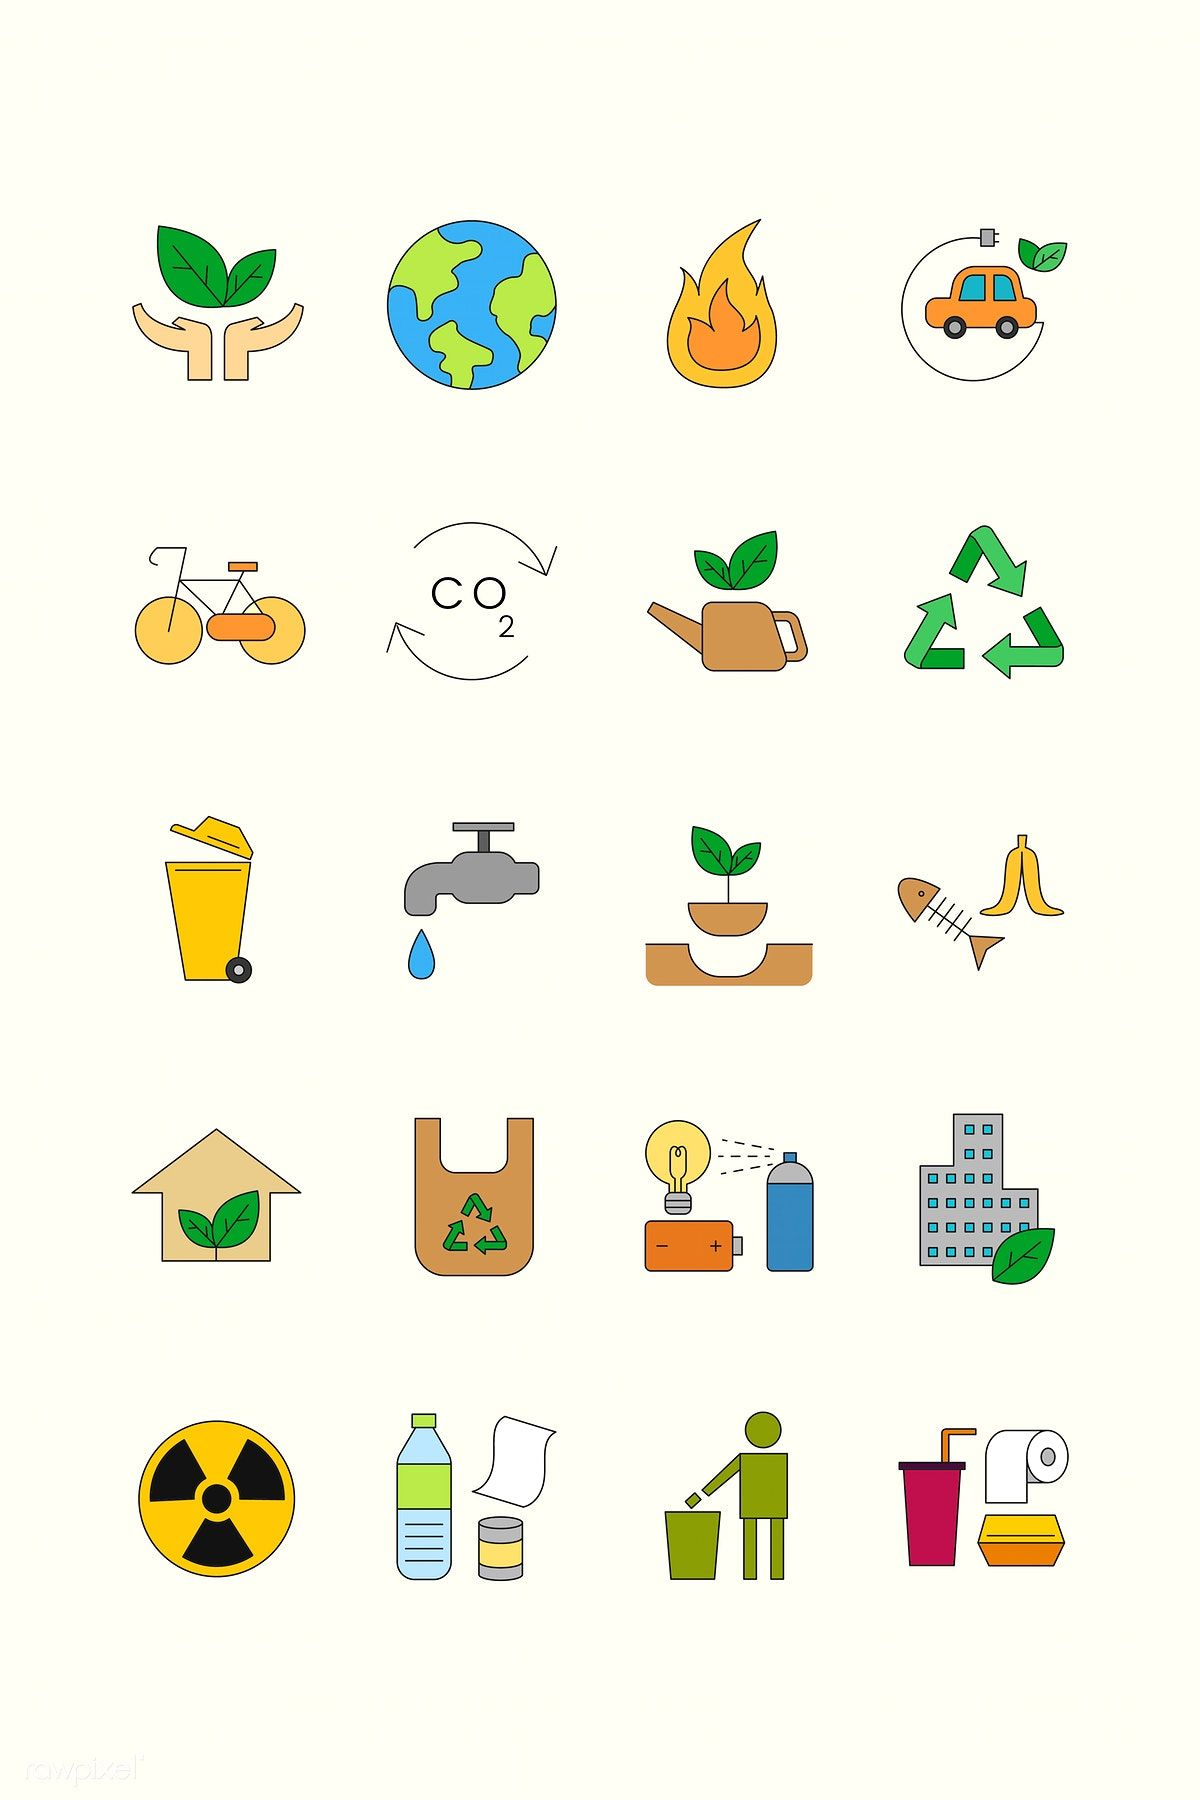 Environment icon design elements vector set free image